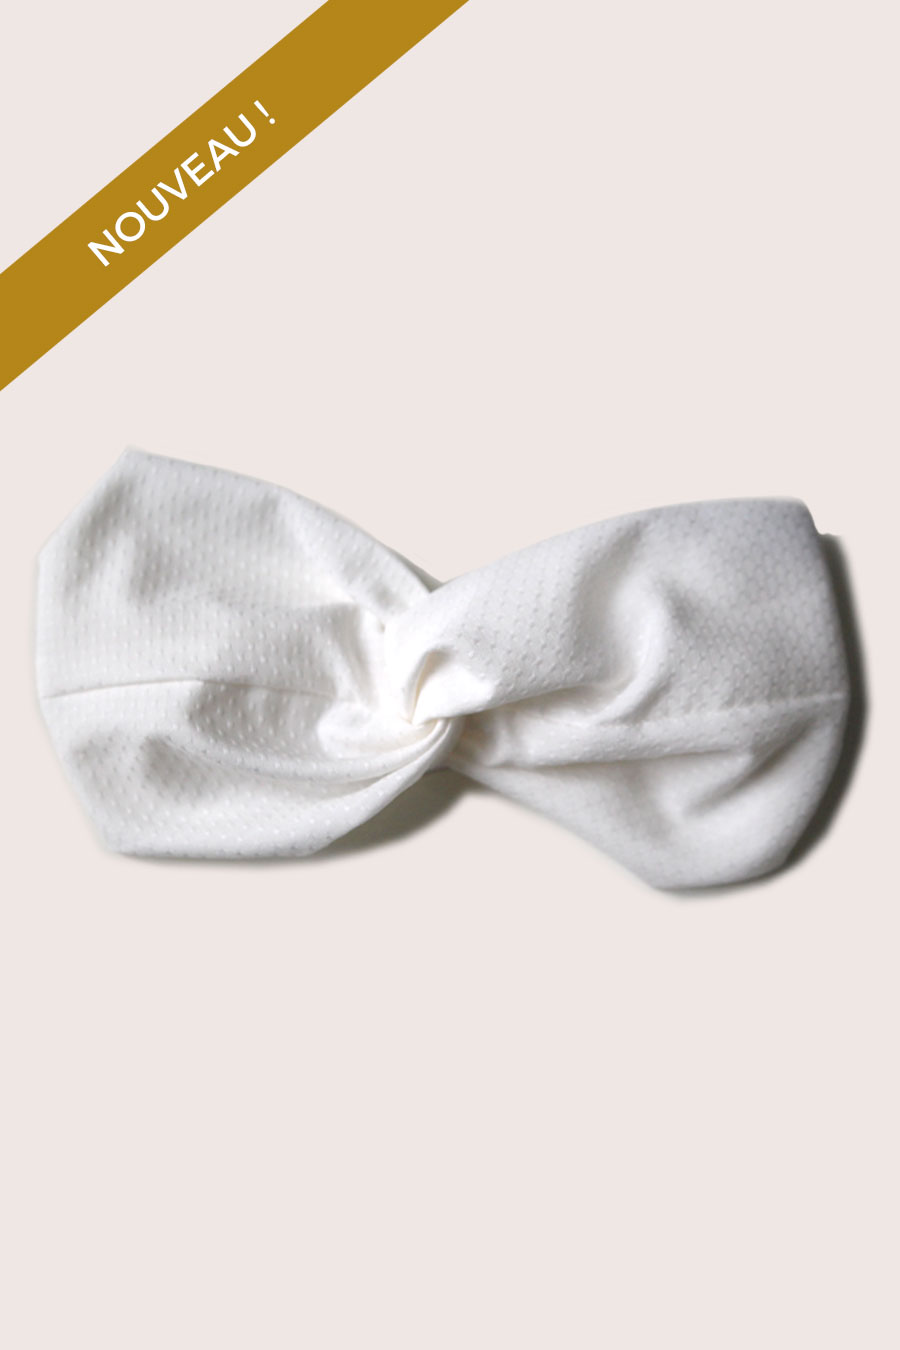 headband-christiane-laurederrey-madeinparis-mode-ethique-slow-fashion-serie-limitee-accessoire-cheveu-mariage1